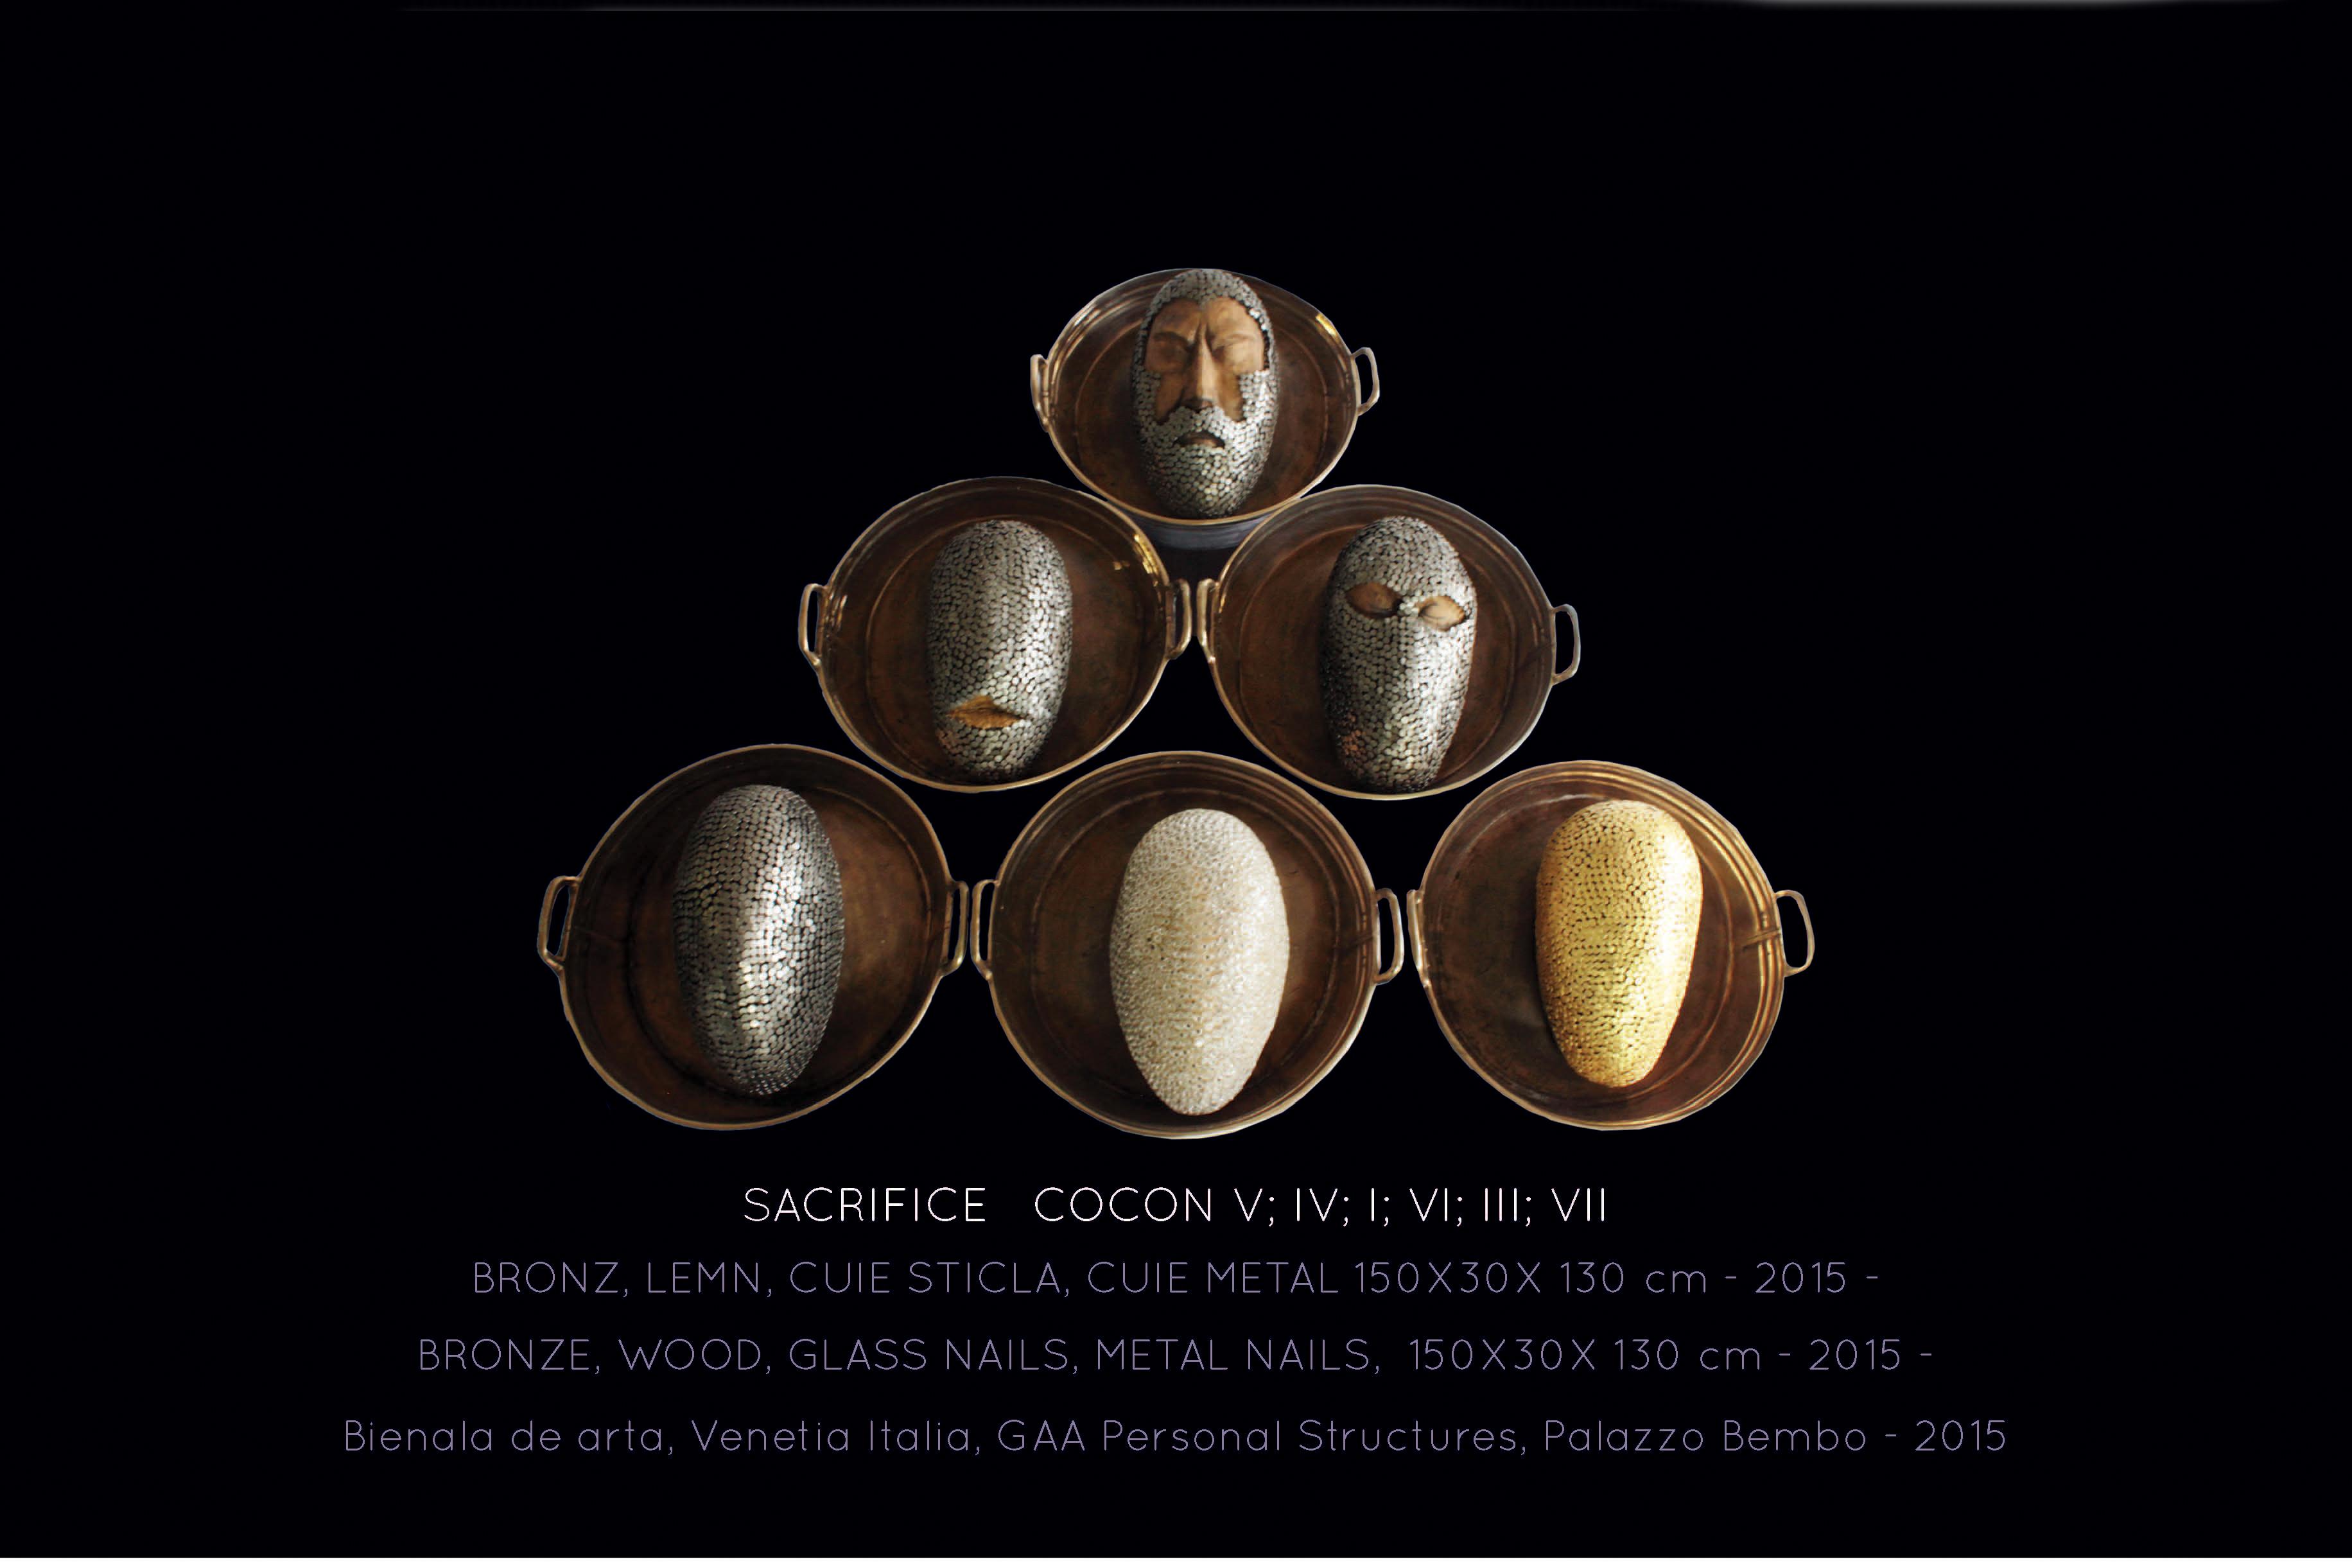 21 The cycle of sacrifice; COCON V;IV;I;VI;III;VII